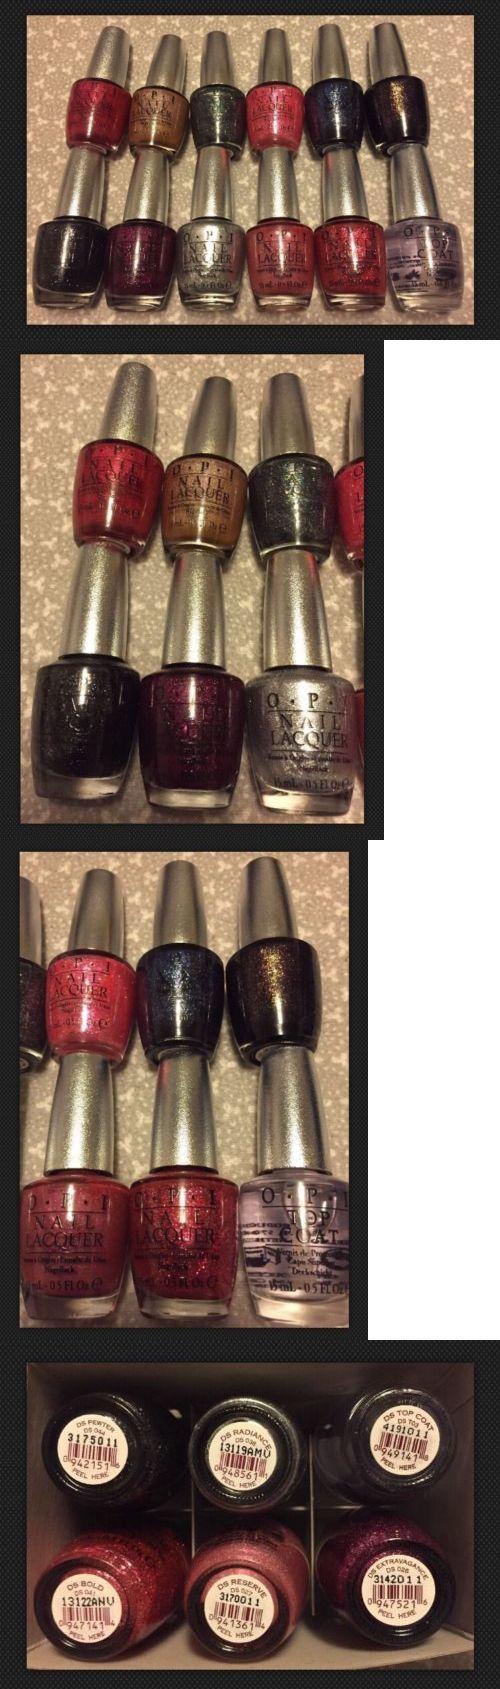 Nail Polish: Lot 12 Opi Designer Series Nail Polish Collection 0.5 Fl Oz New! -> BUY IT NOW ONLY: $75.0 on eBay!